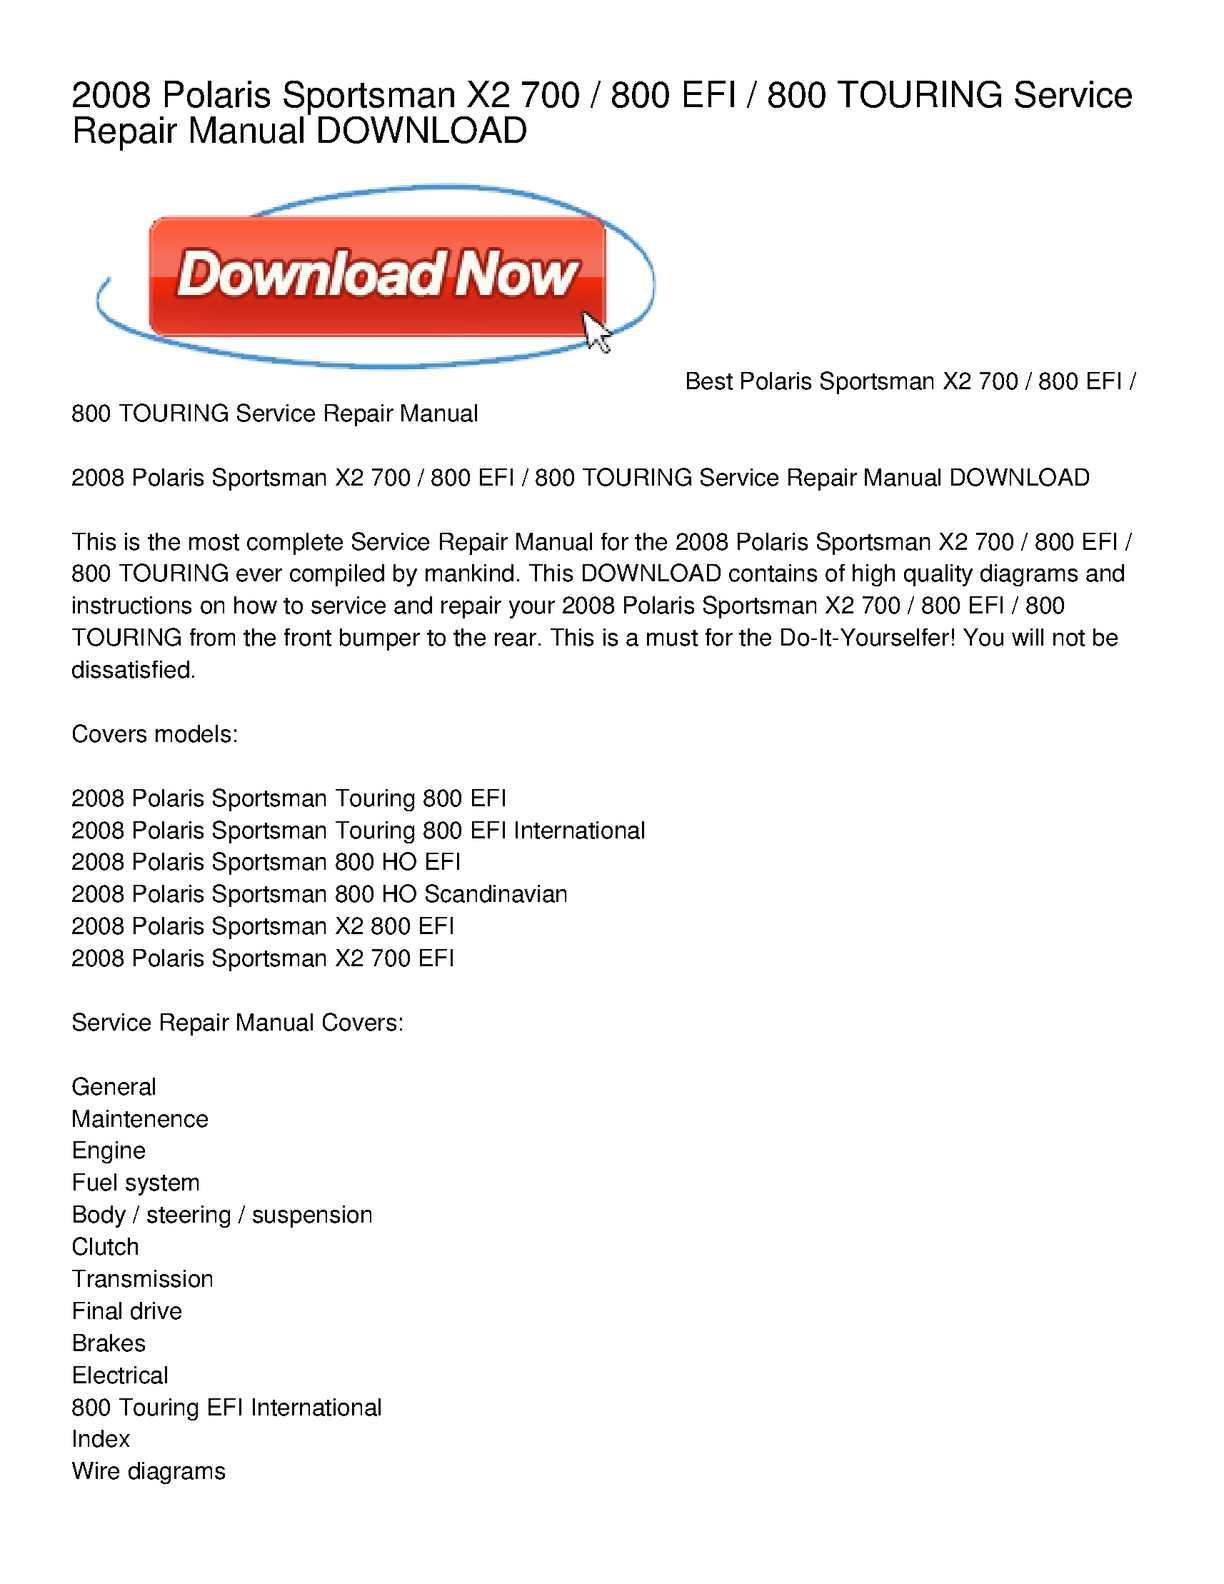 Calamo 2008 Polaris Sportsman X2 700 800 Efi Touring Wiring Diagram Service Repair Manual Download